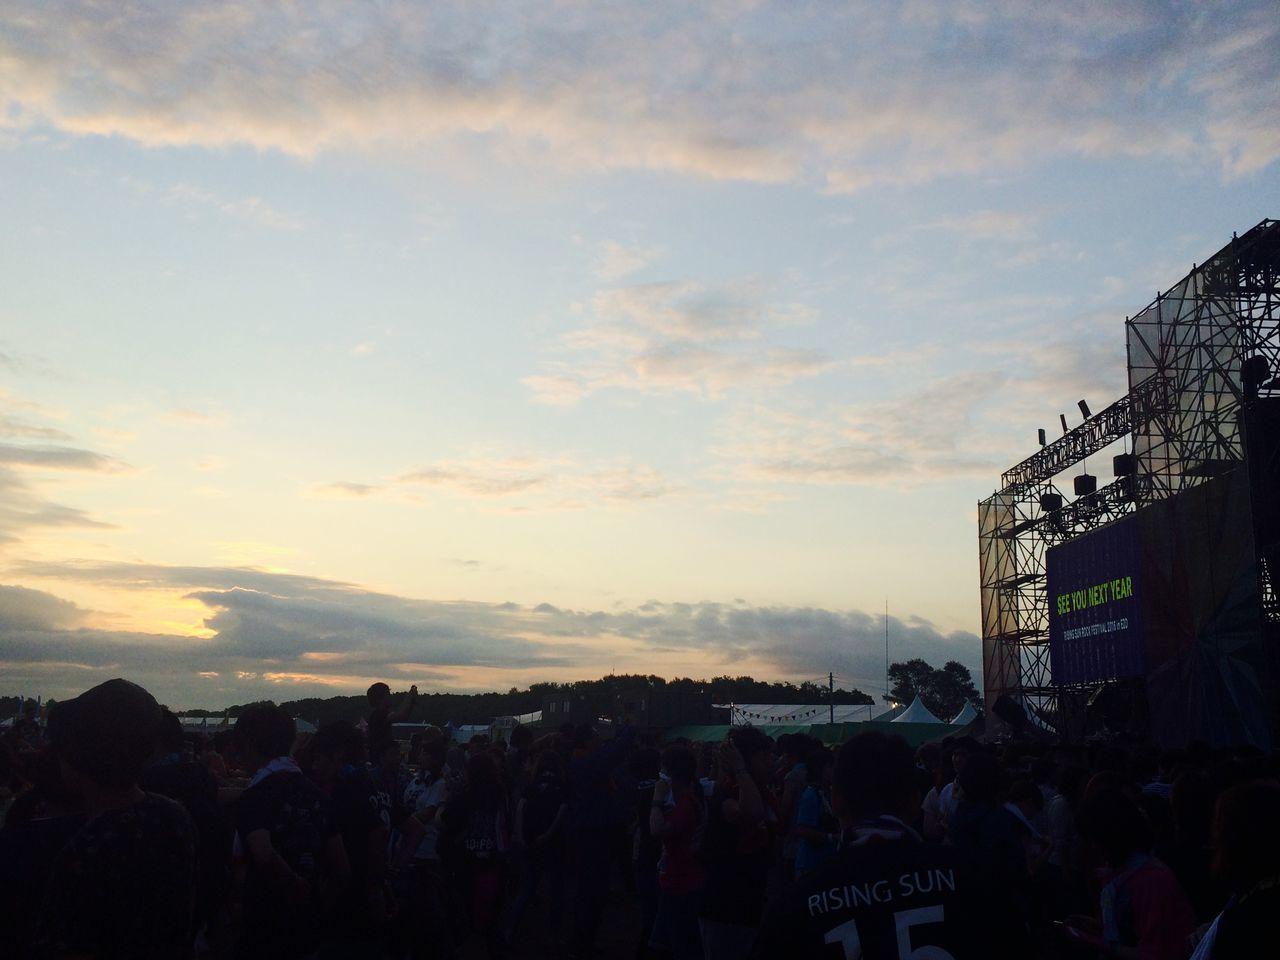 Rising Sun Rock Festival 2015